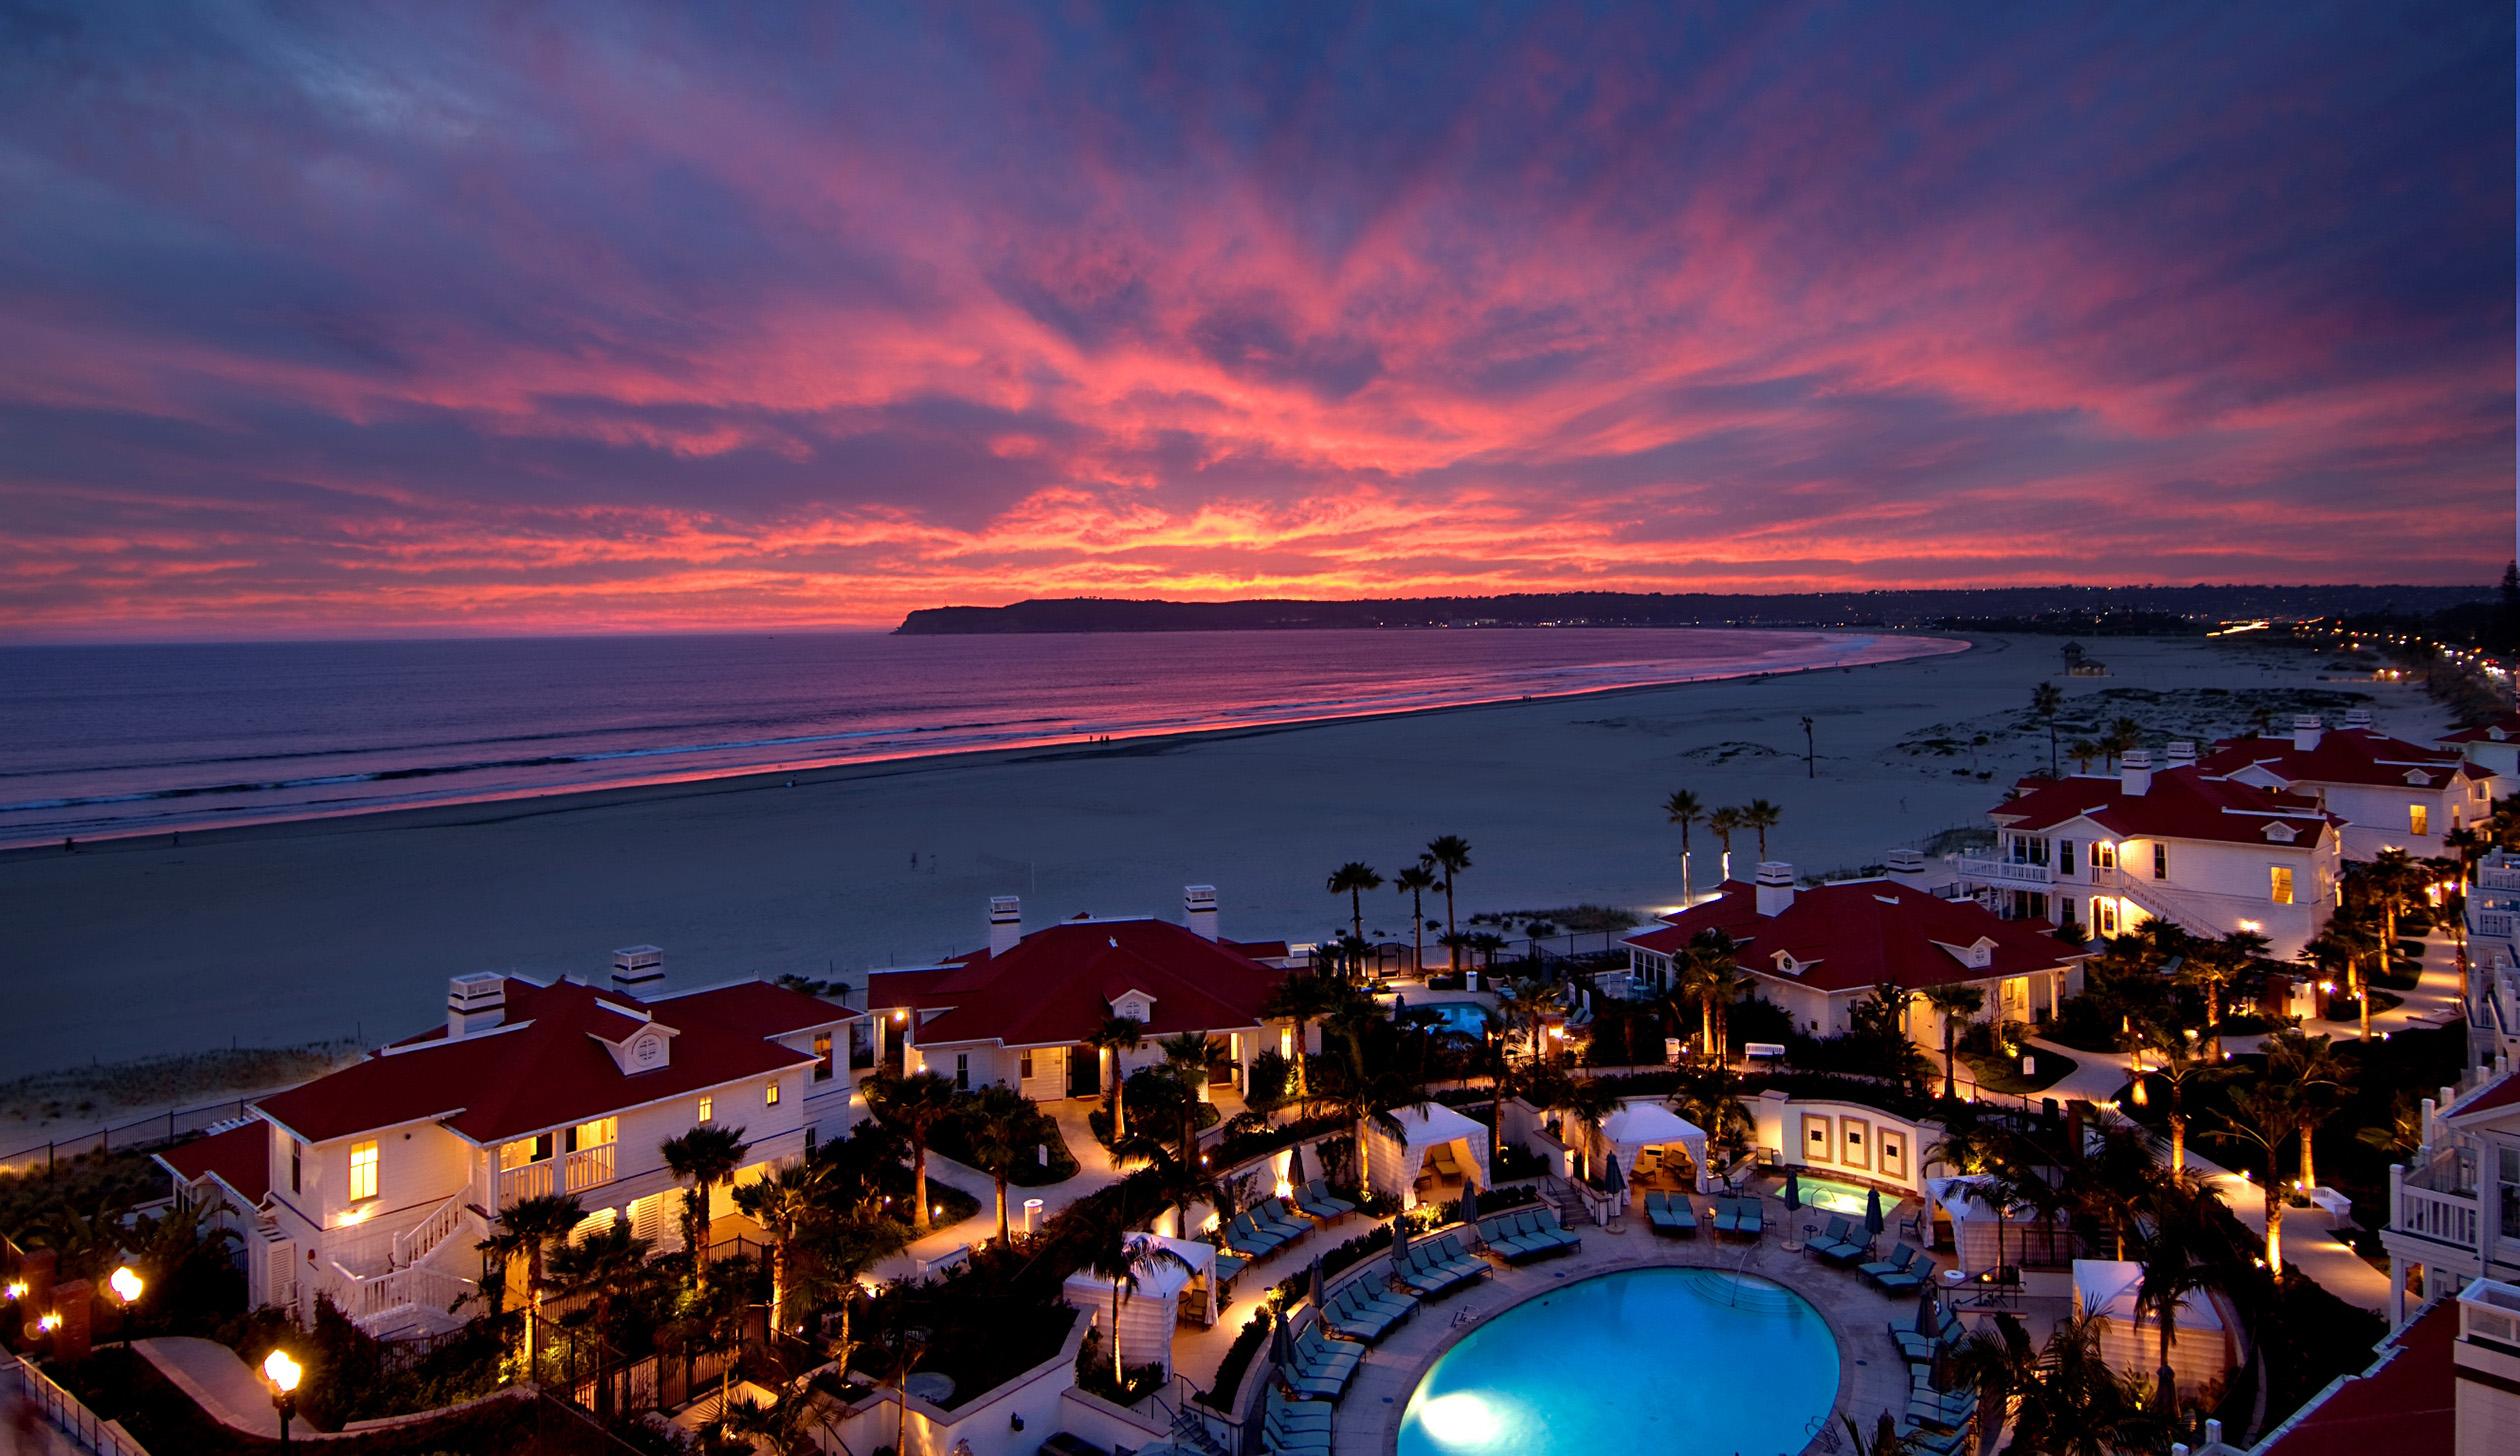 Beach Village at sunset